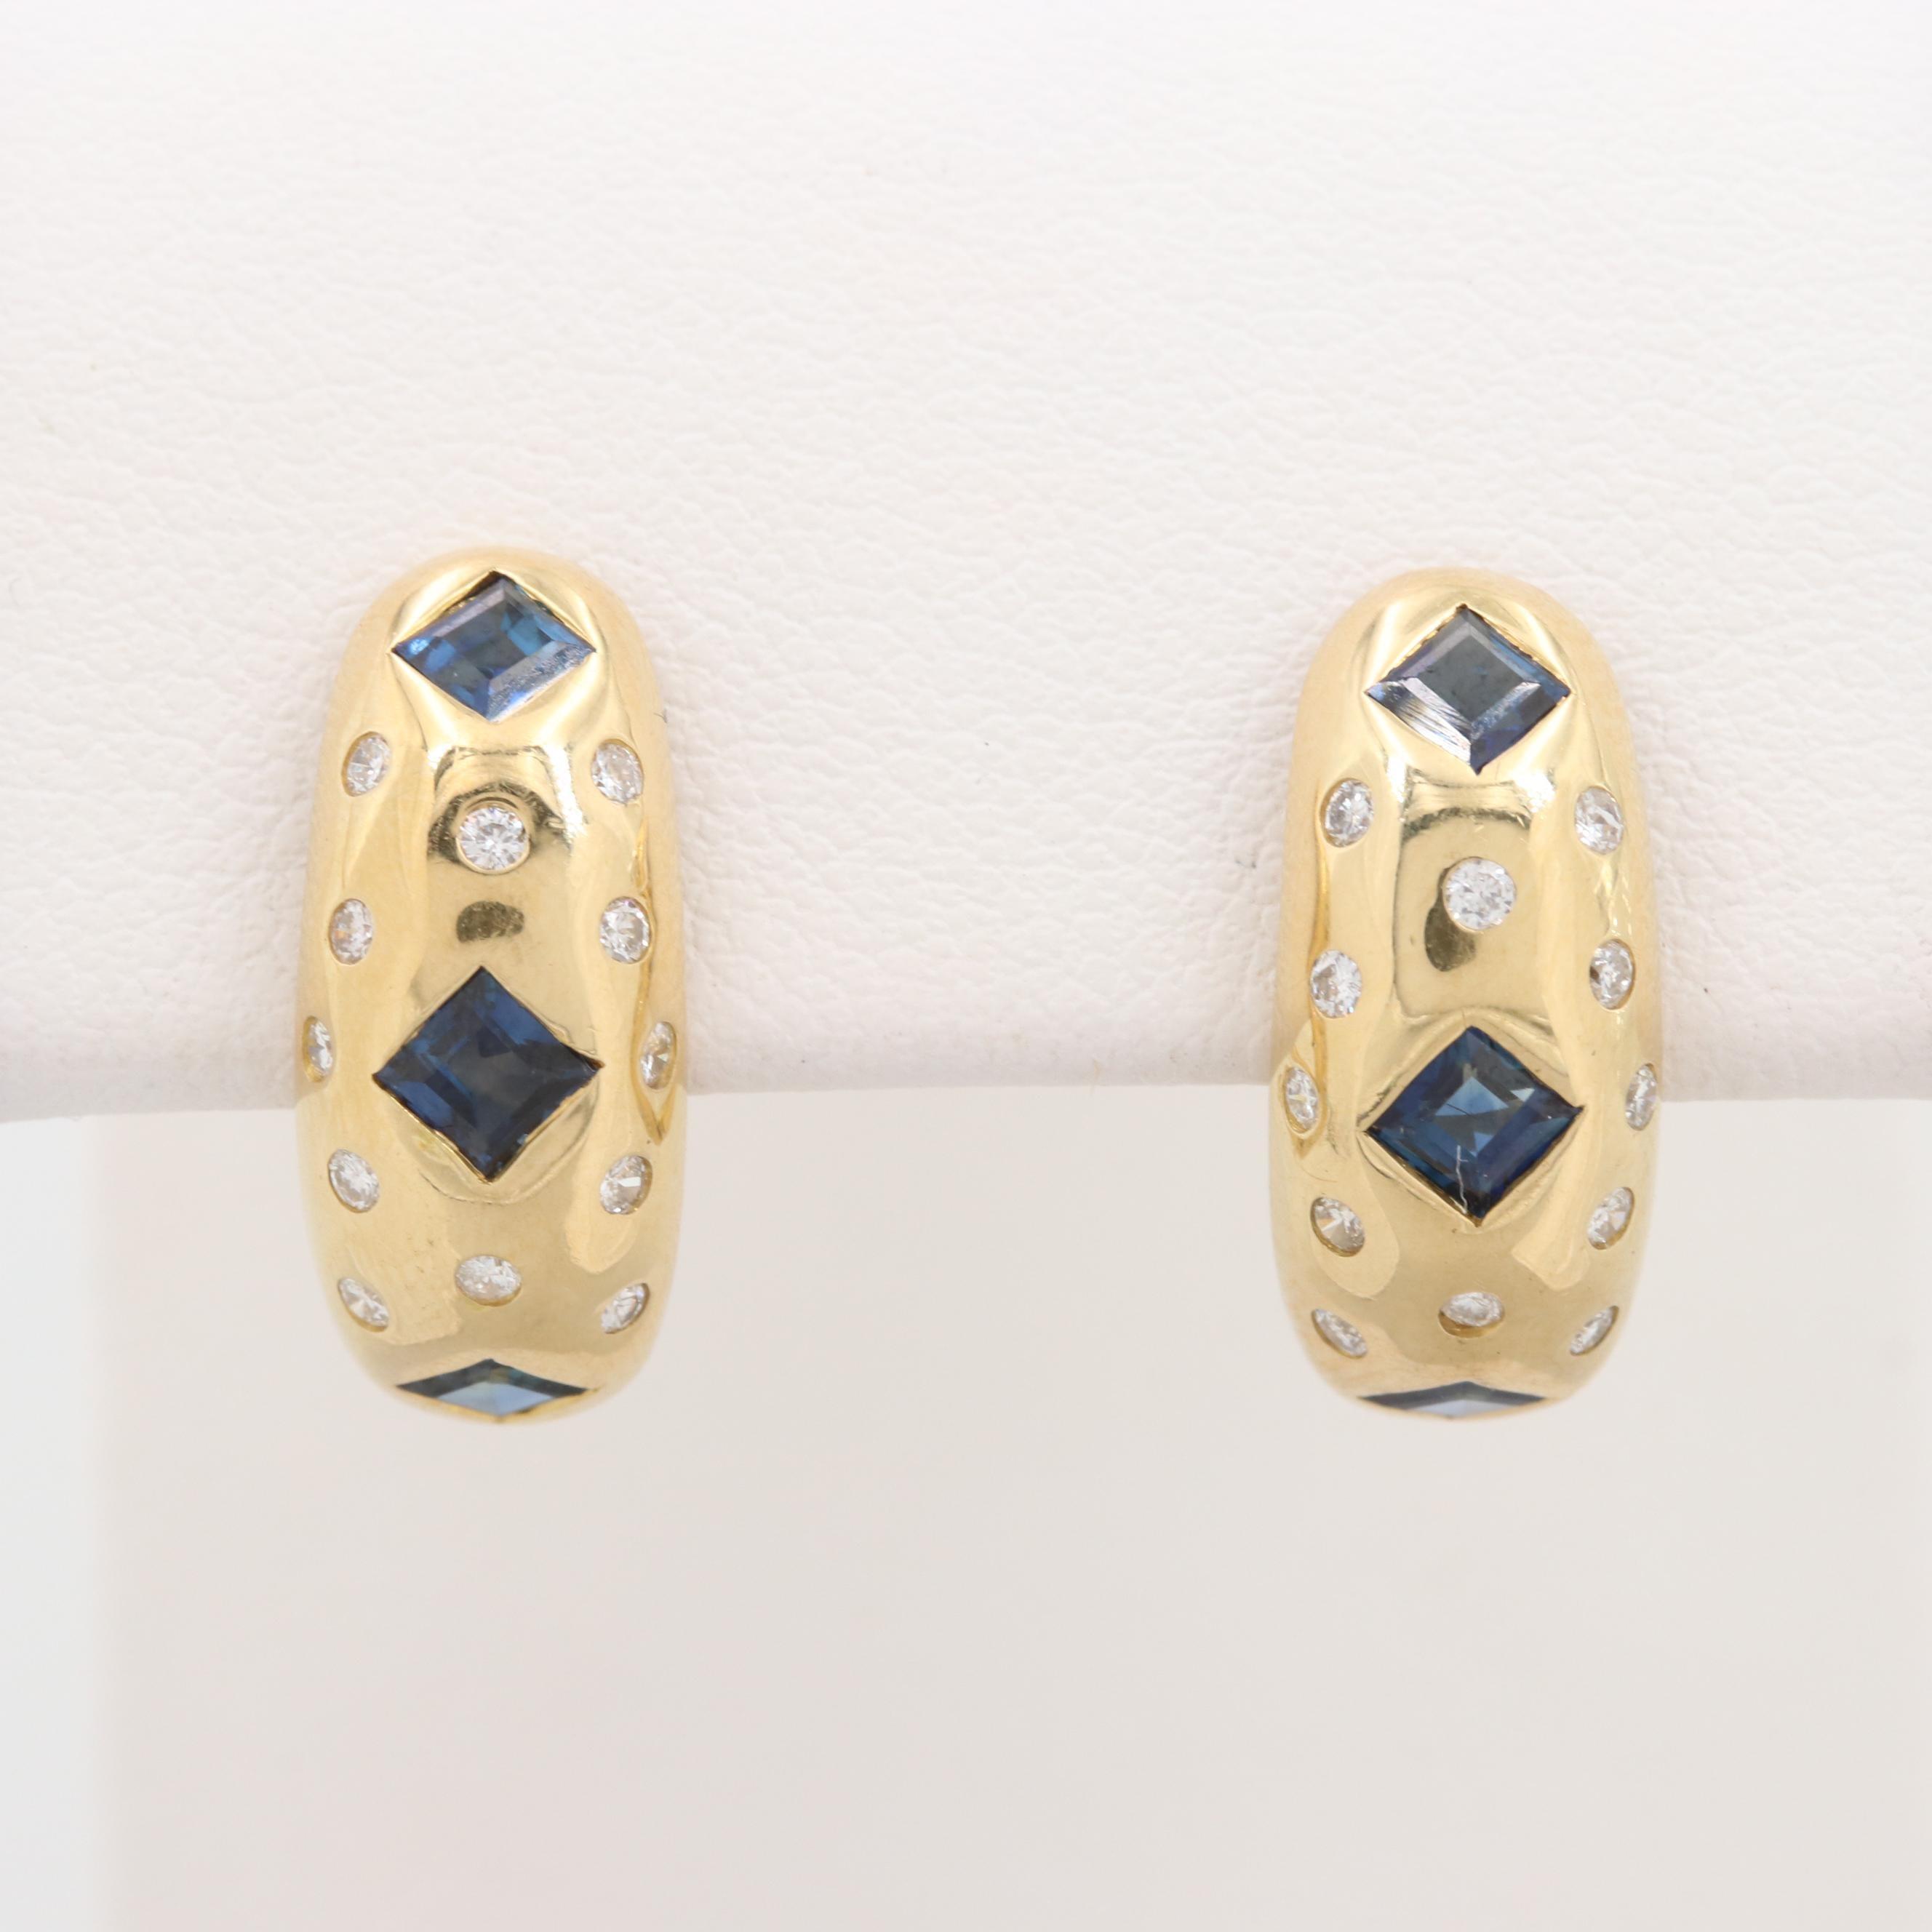 18K Yellow Gold Blue Sapphire and Diamond J-Hoop Earrings